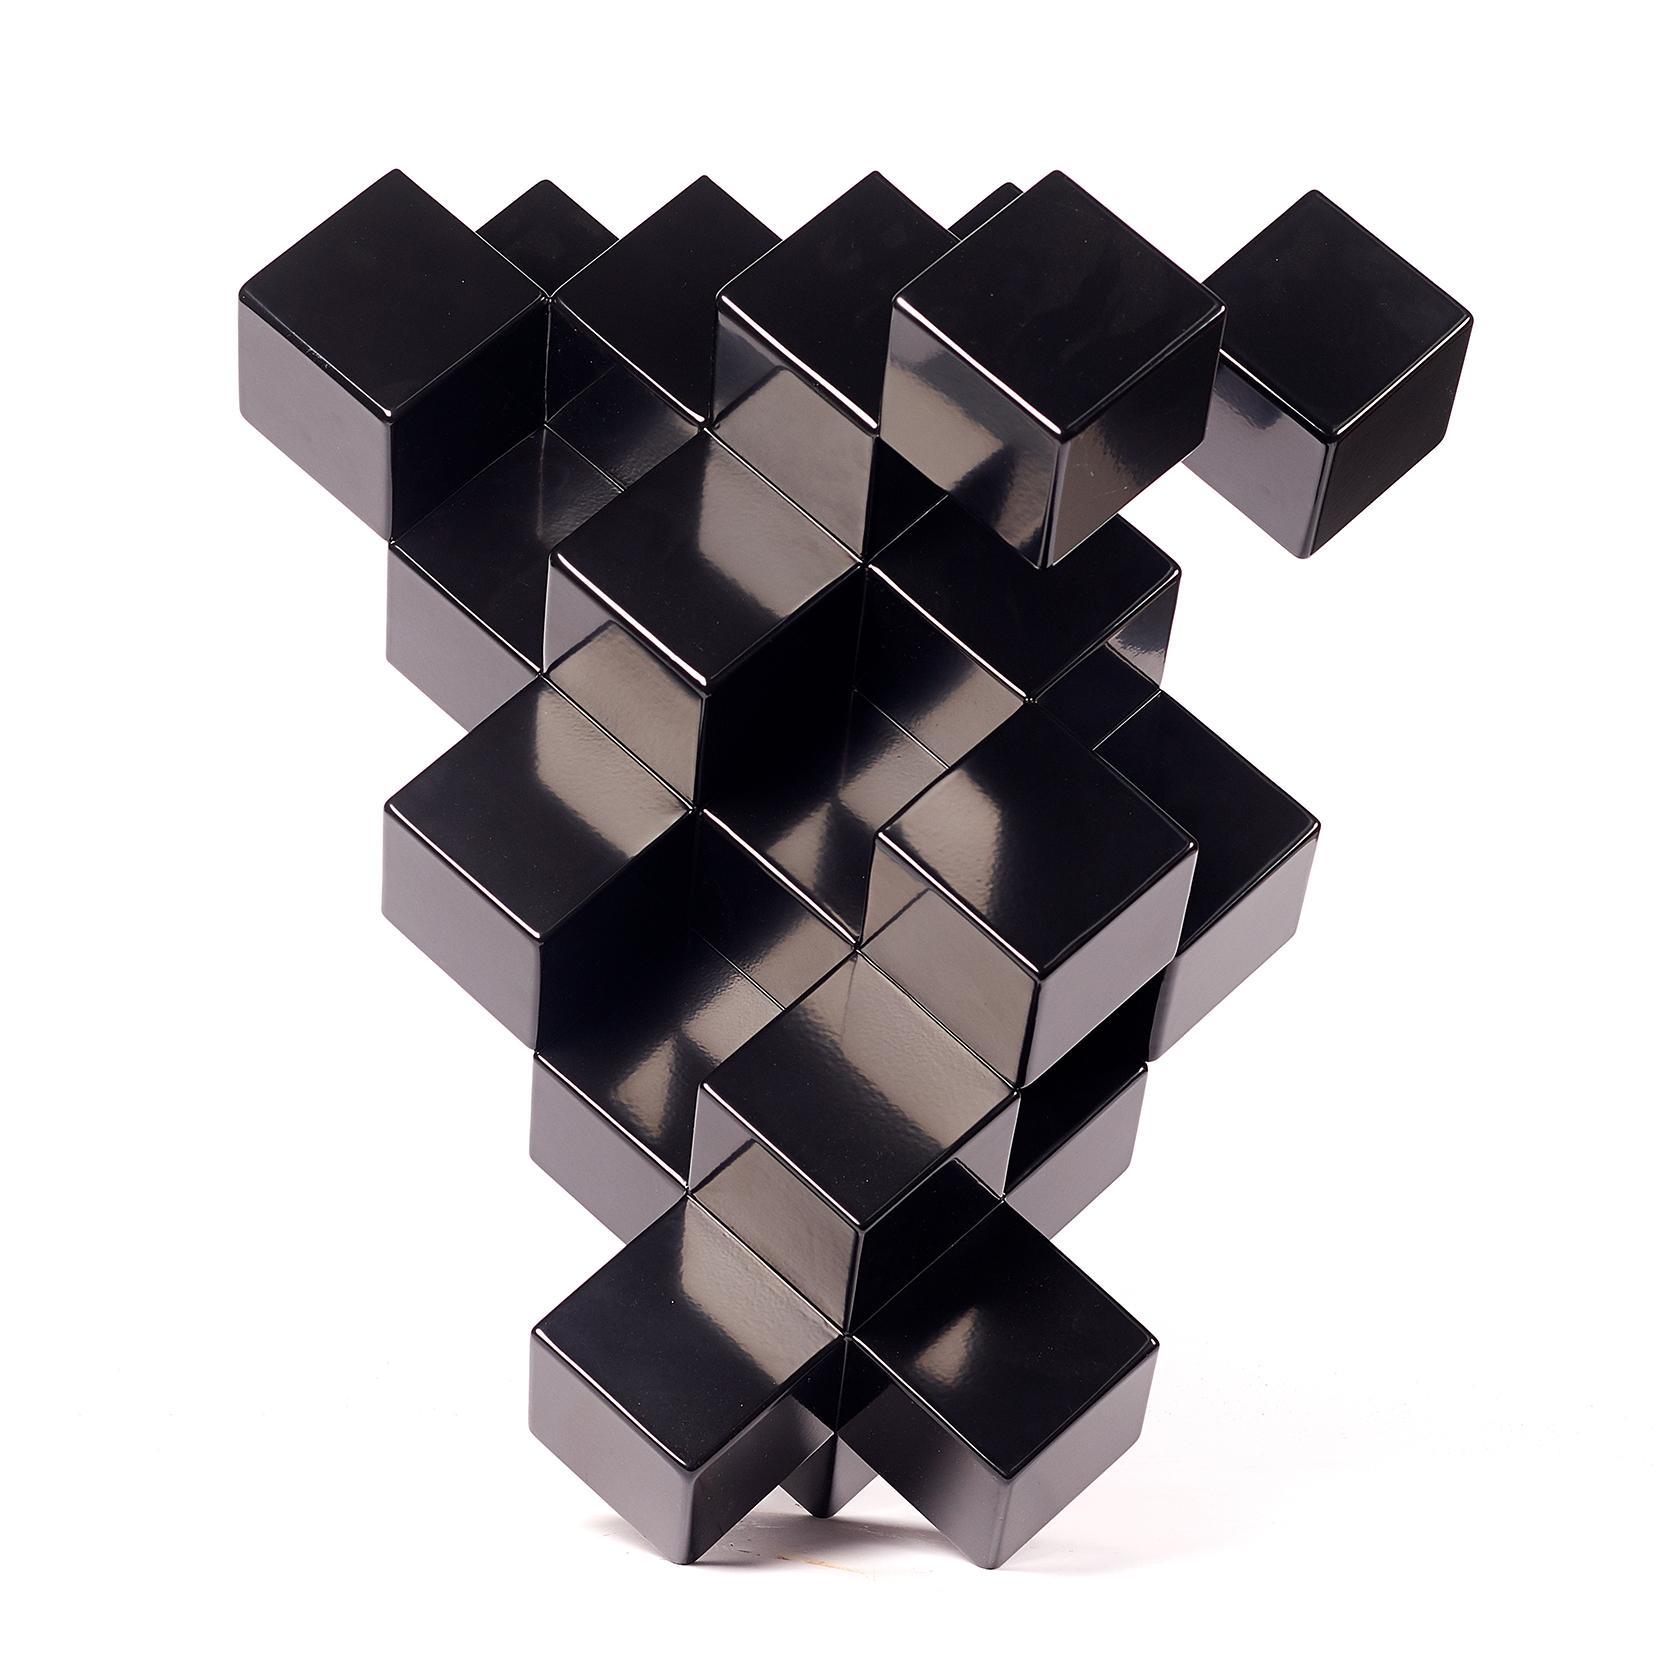 2018_04_08_will_nash_black_cubic_007_int_web_Square.jpg